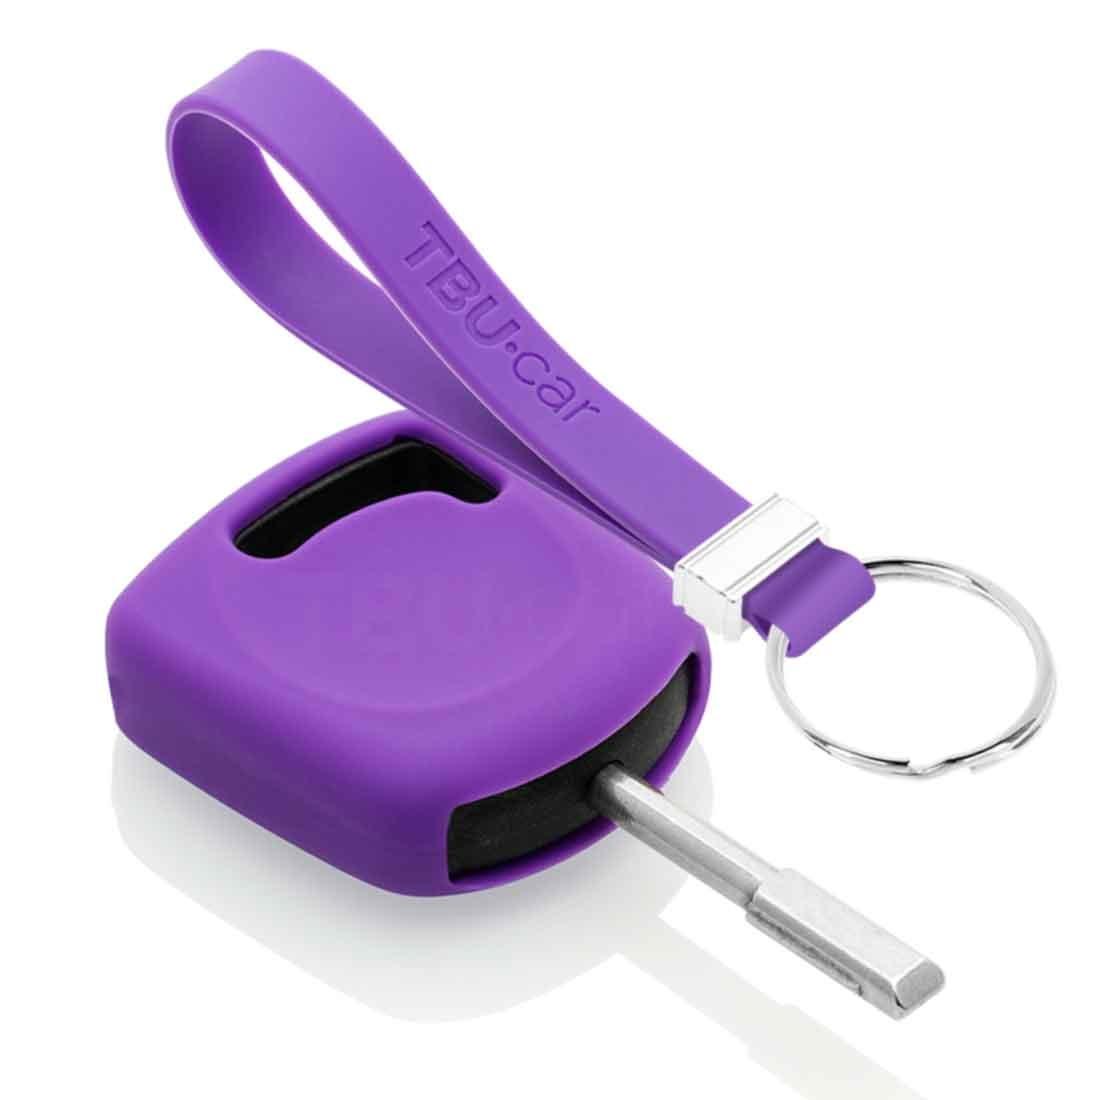 TBU car TBU car Autoschlüssel Hülle kompatibel mit Ford Standardschlüssel - Schutzhülle aus Silikon - Auto Schlüsselhülle Cover in Violett